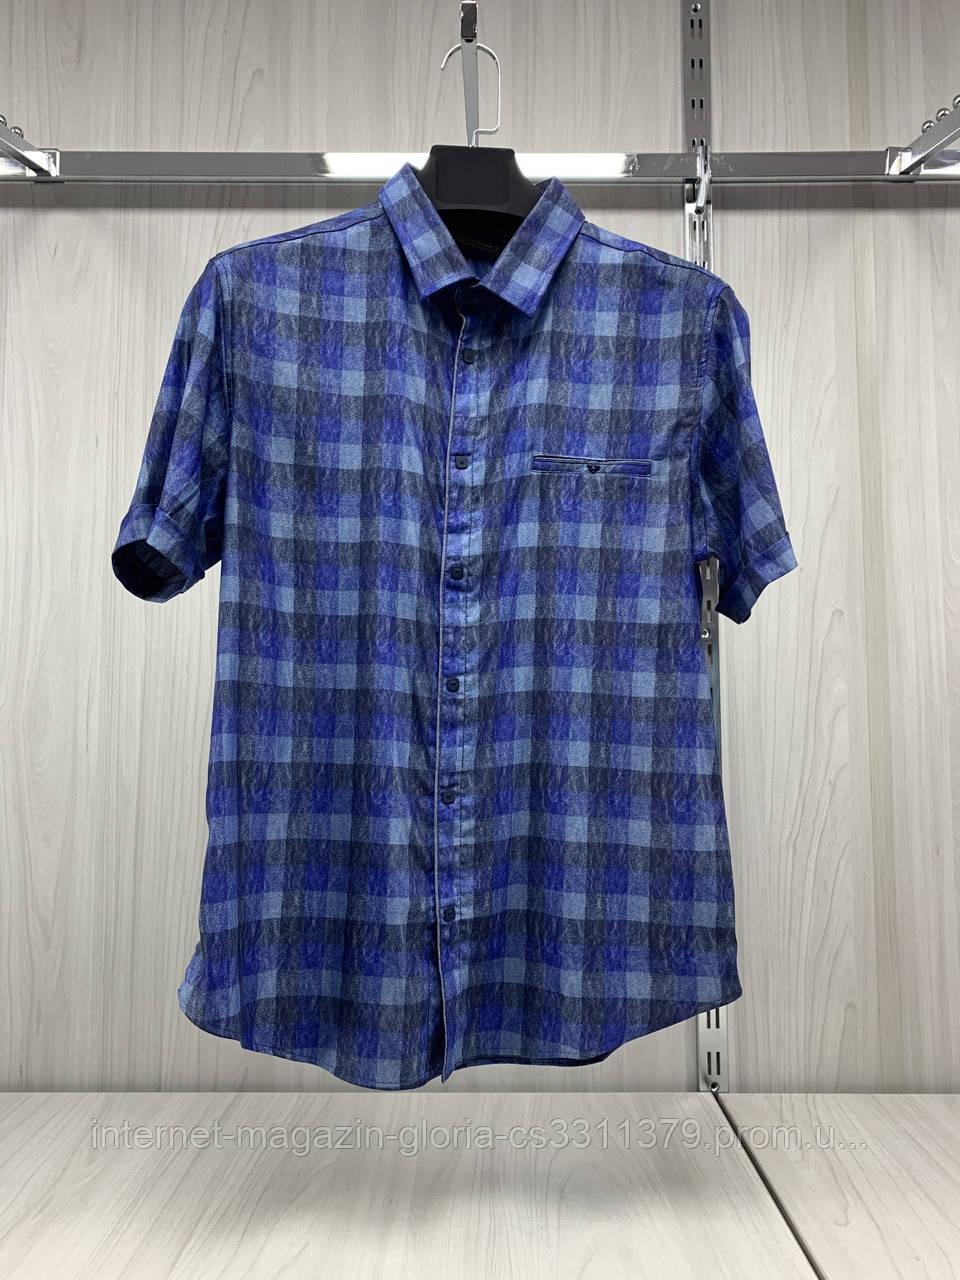 Мужская рубашка Amato. AG.KG19585-v01. Размеры: L,XL,XXL.